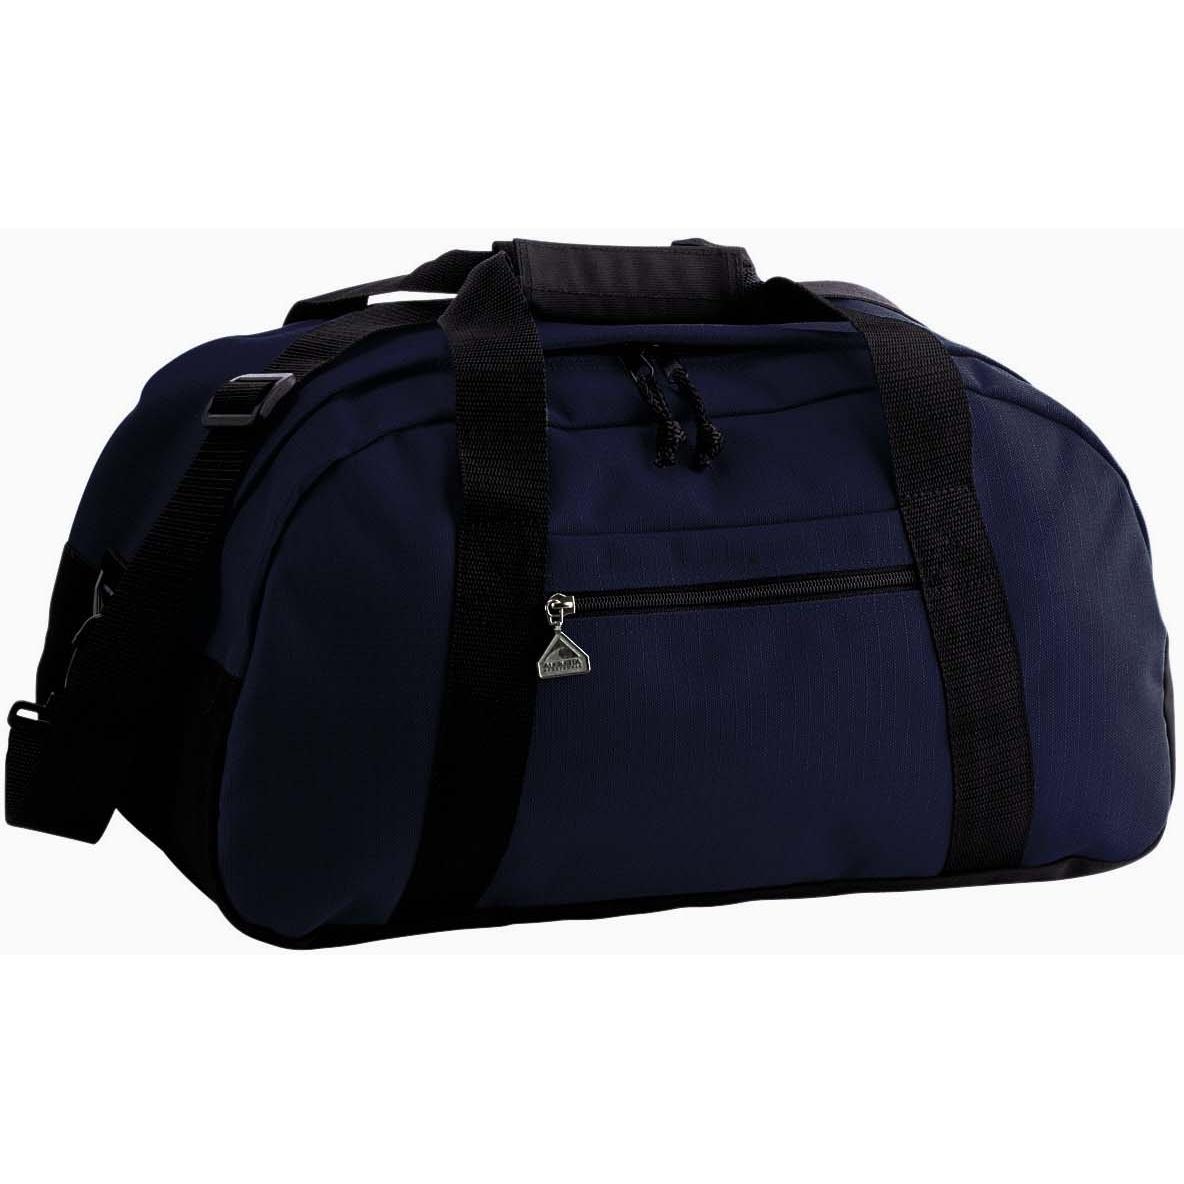 Augusta Ripstop Small Duffel Bag - Navy/Black